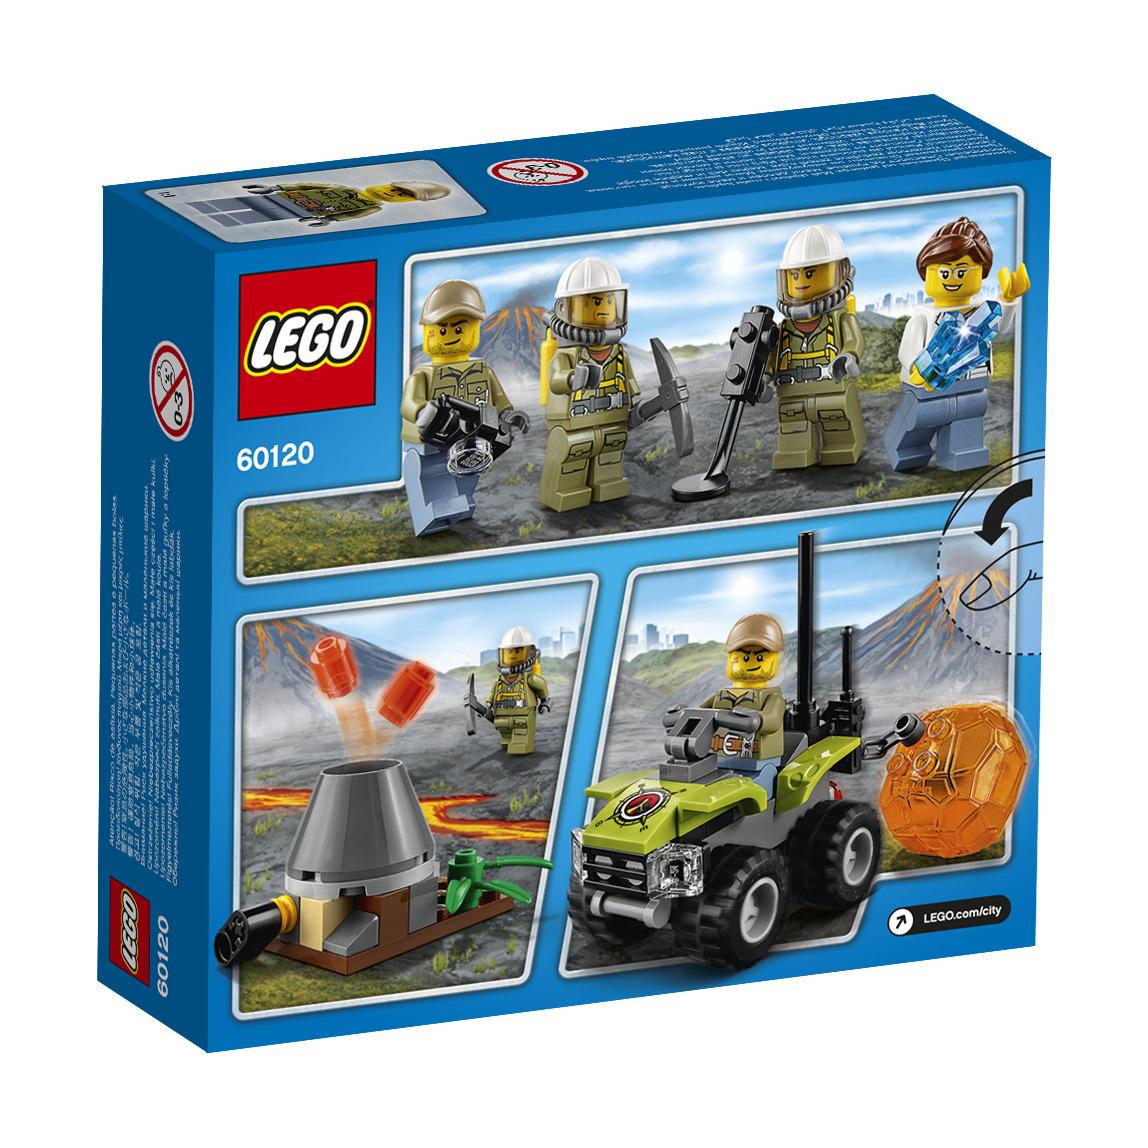 Lego City Starter Set Vulcano 60120 Lego City Giocattoli #803715 4070 2678 H Tavolo Da Pranzo